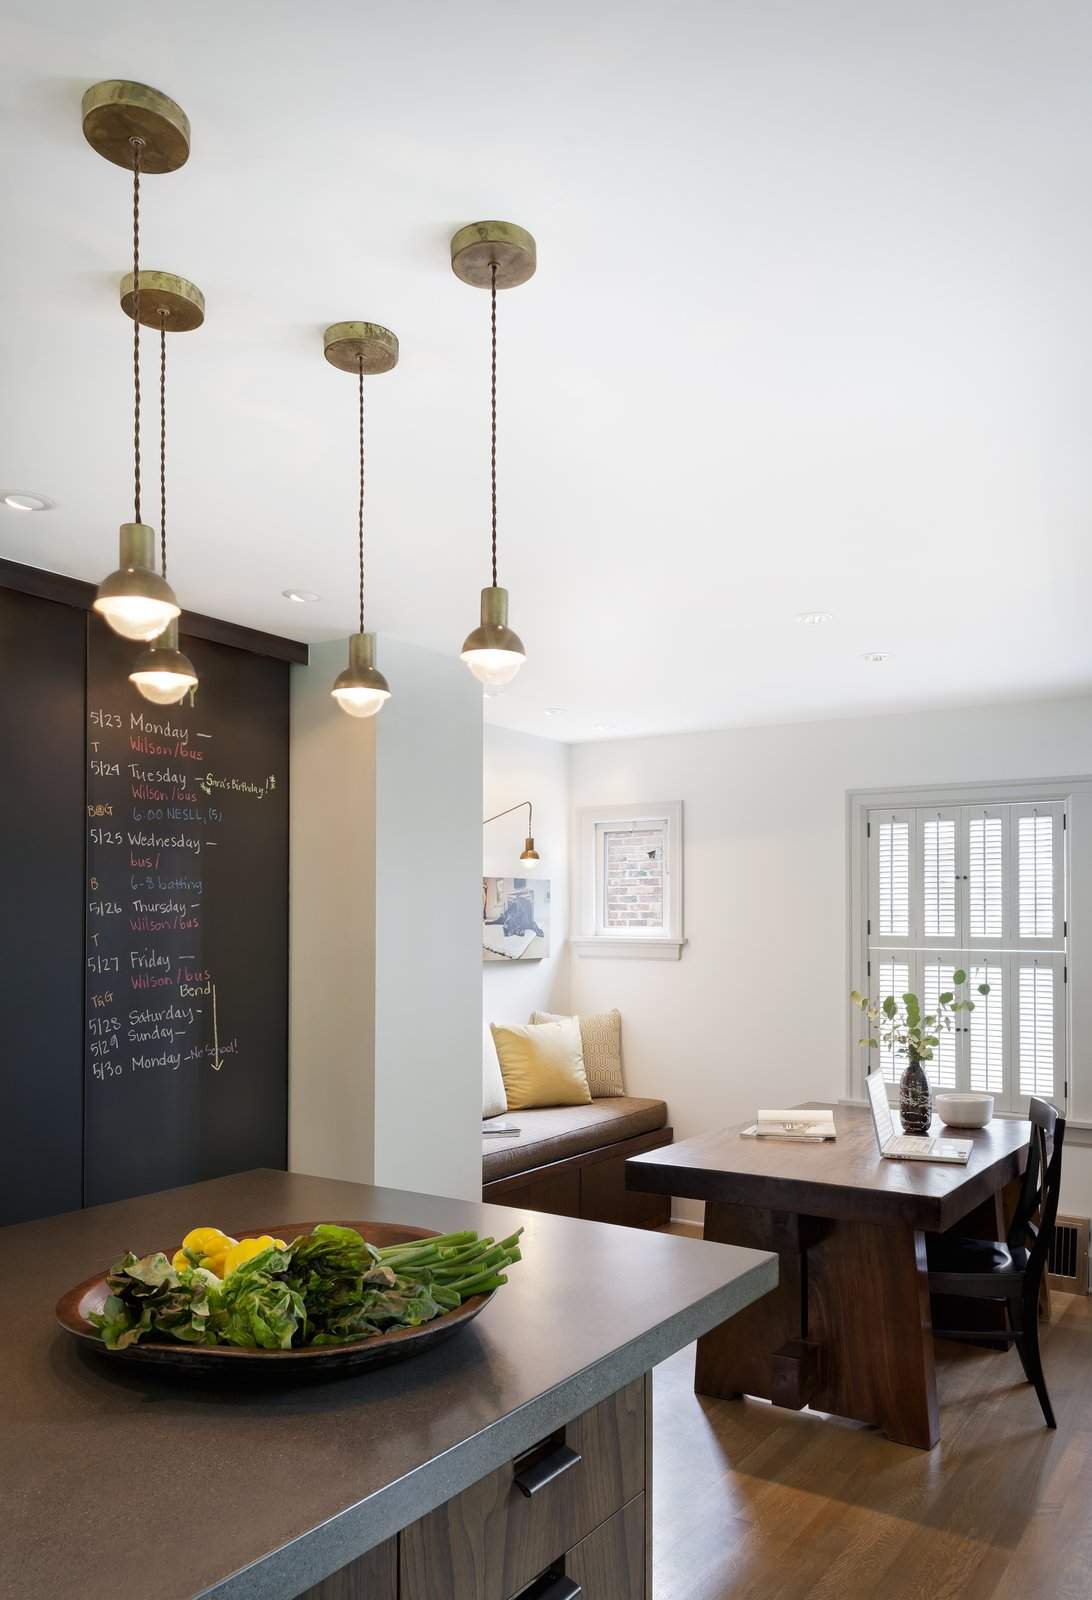 Dining Room Brick House transformed  Brick House Transformed by ReruchaStudio